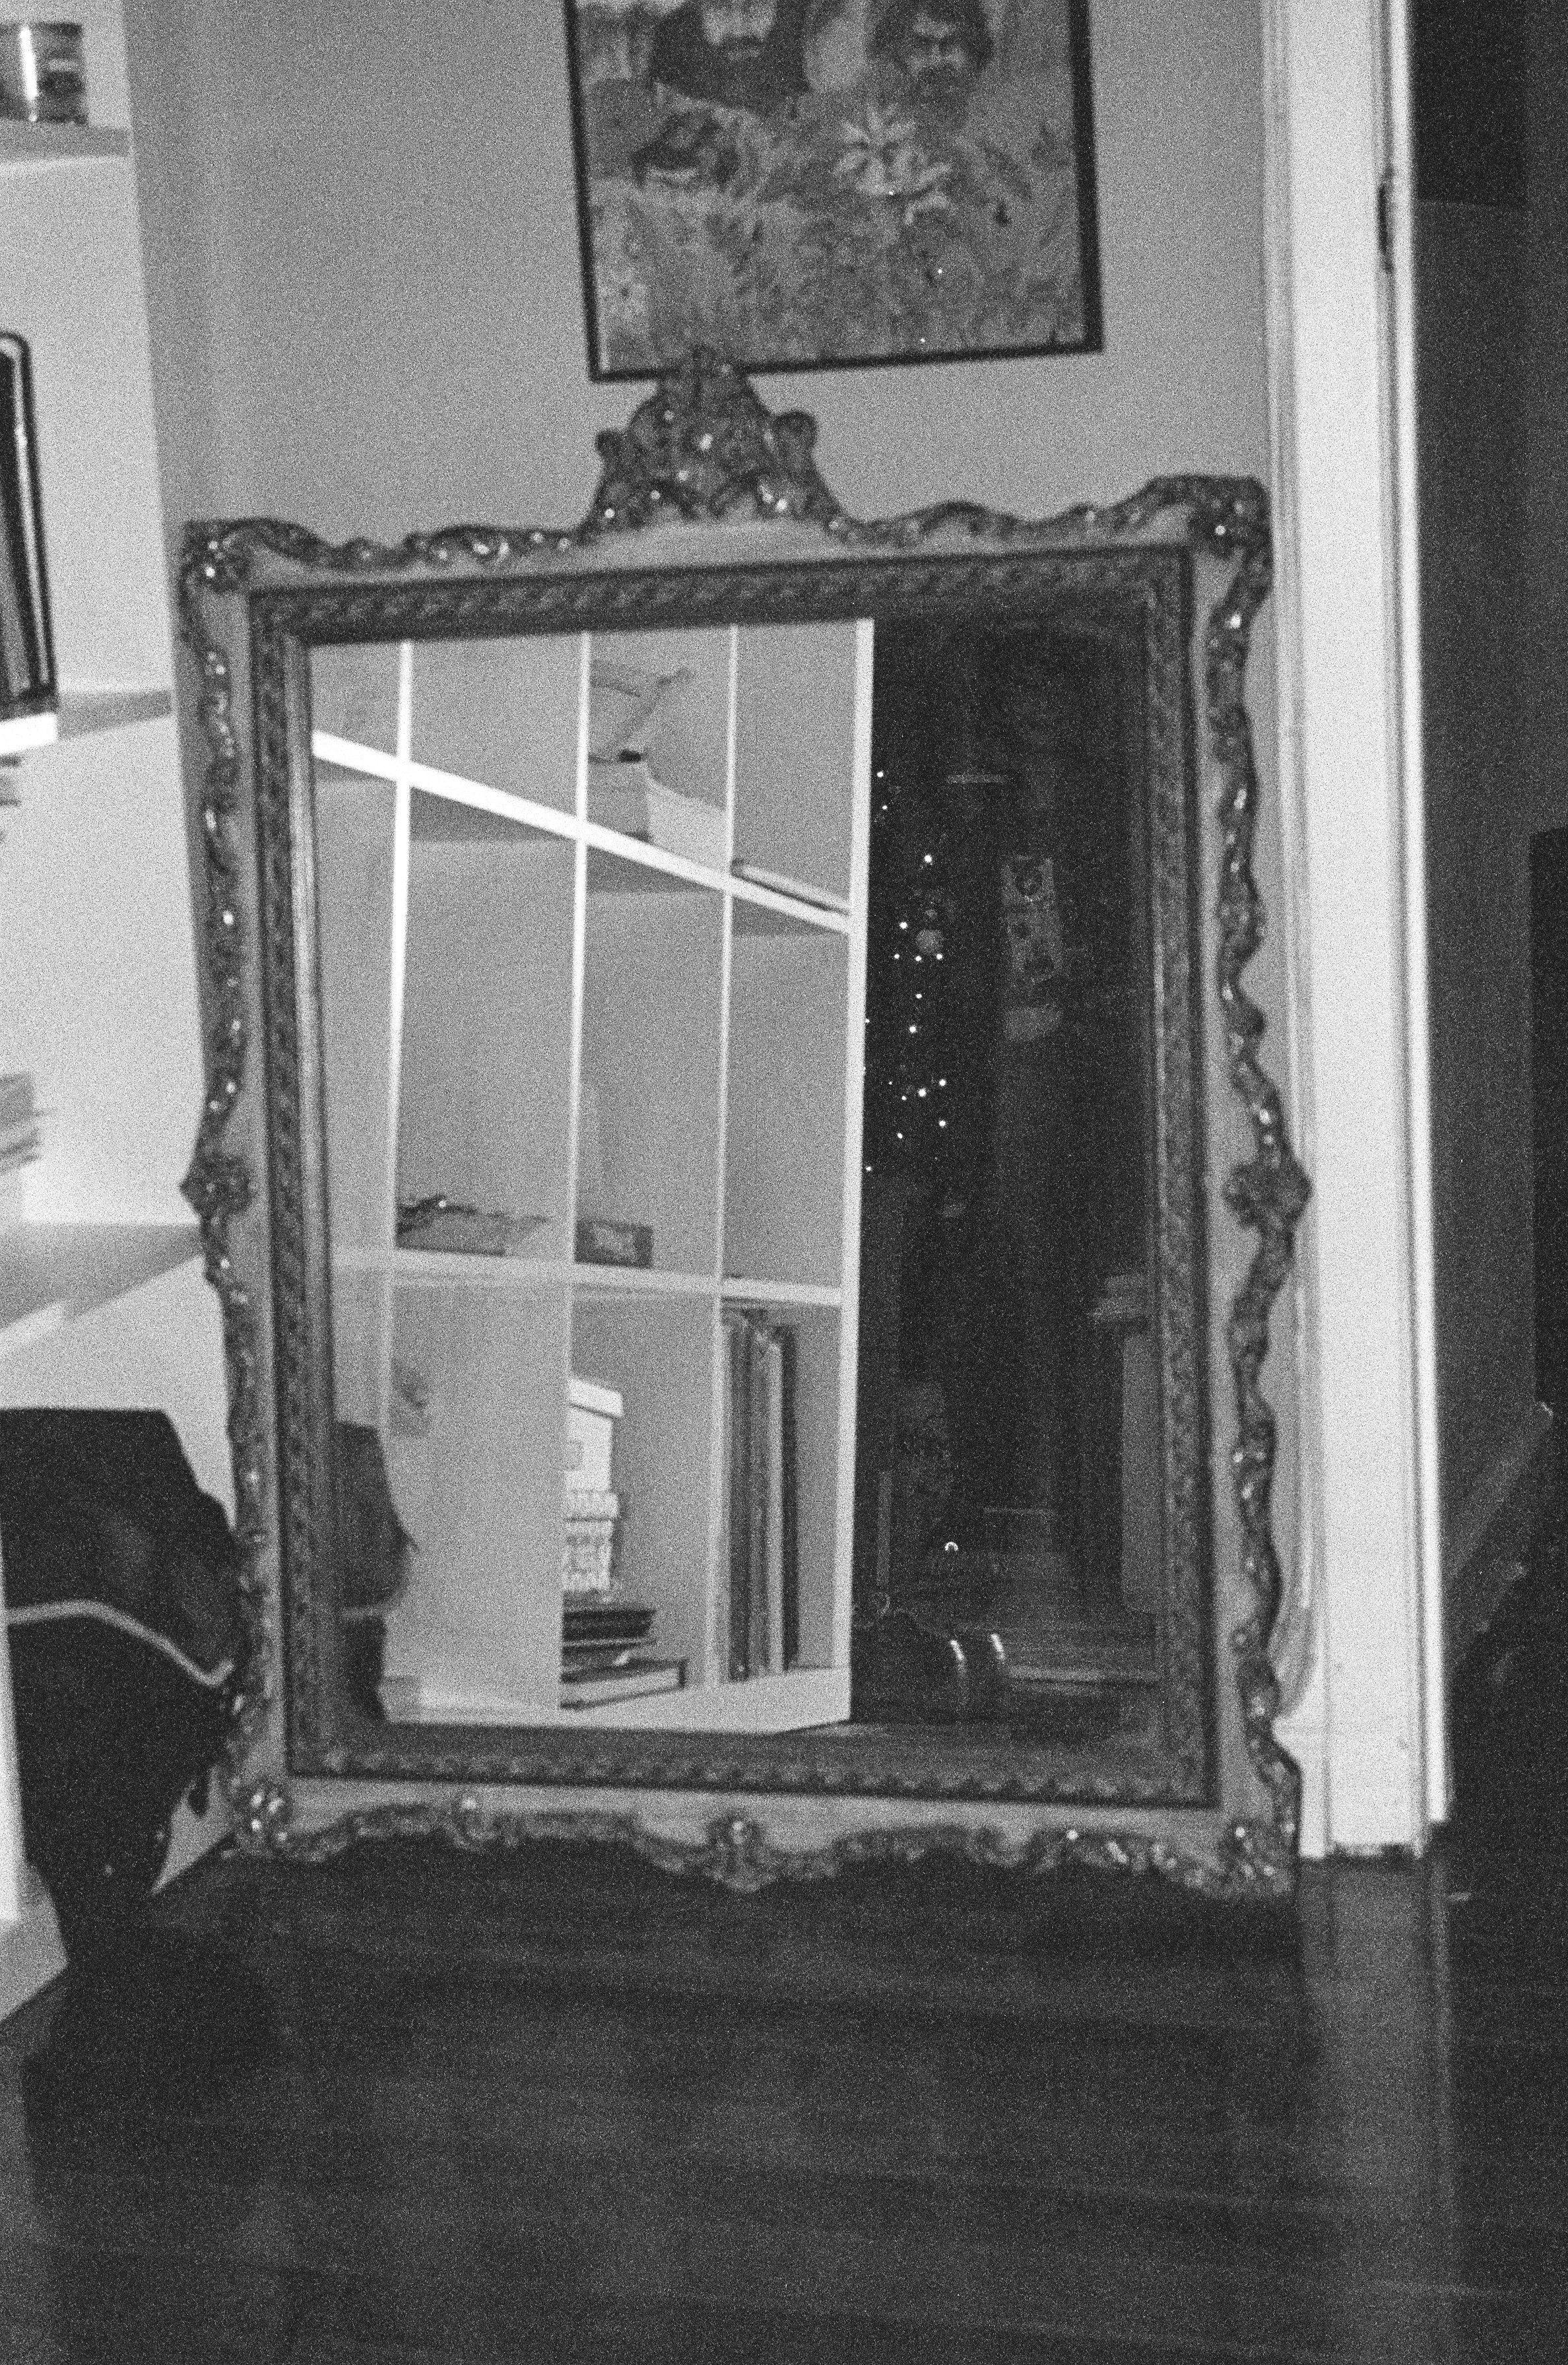 Vintage mirror from Jake's flea market - only $50!